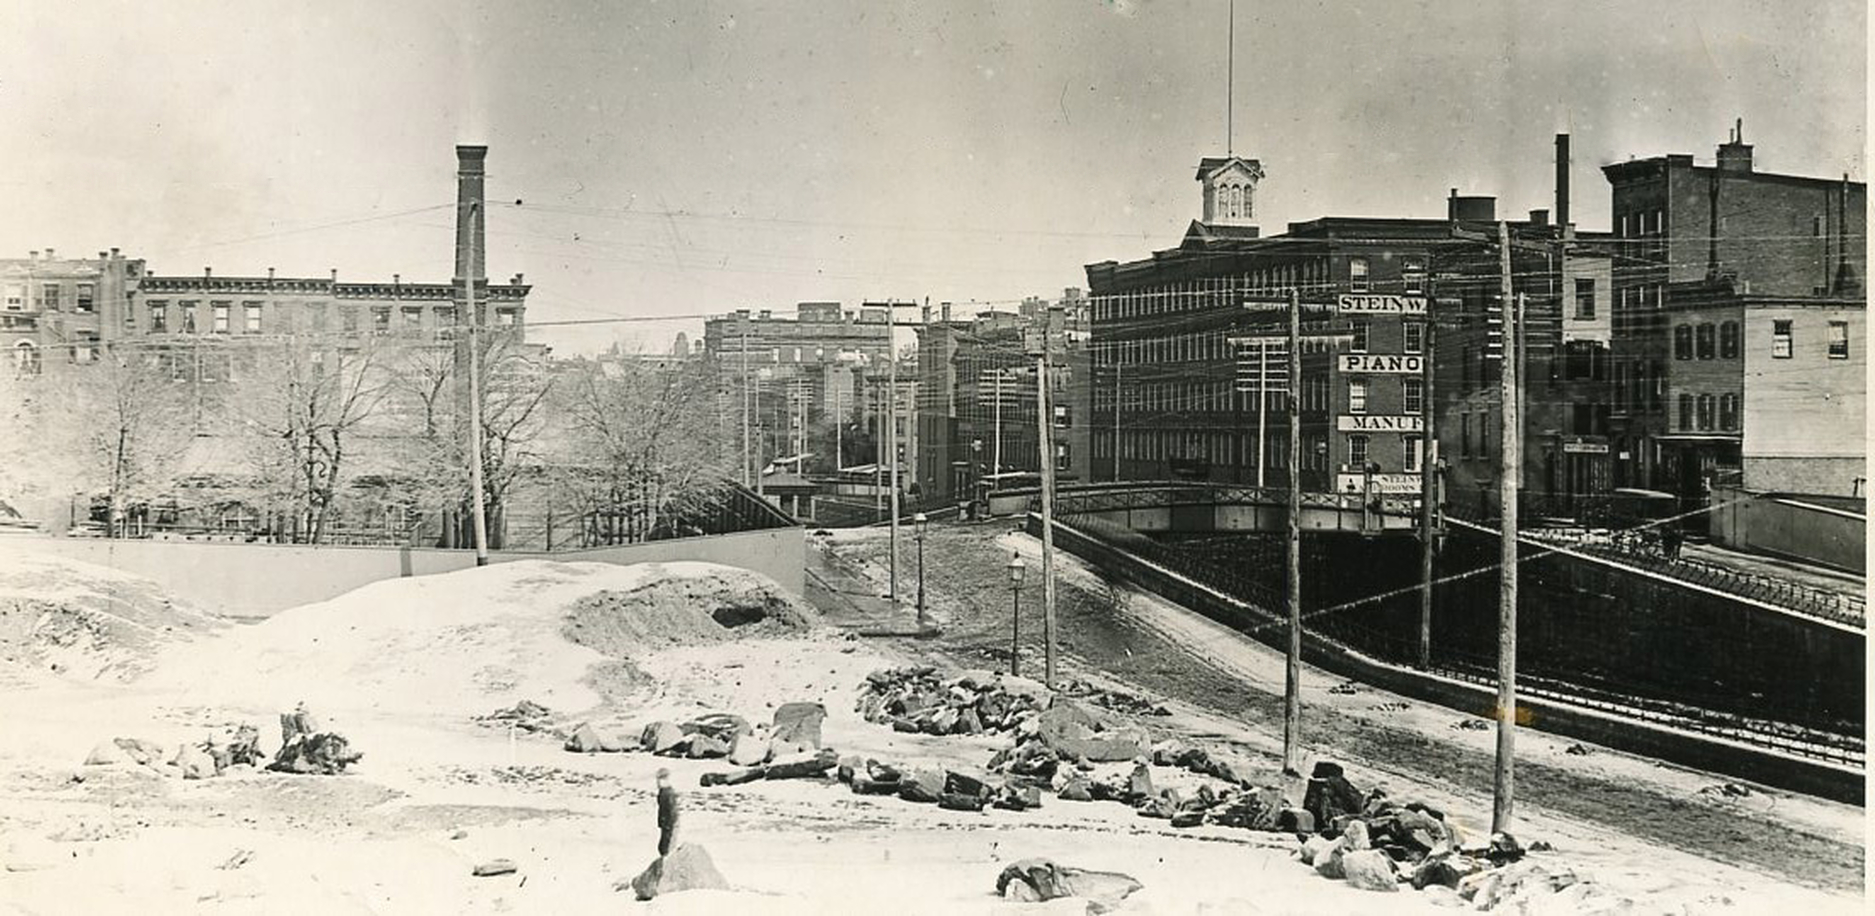 Old New York In Photos #41 - Park Avenue & 51st Street 1889